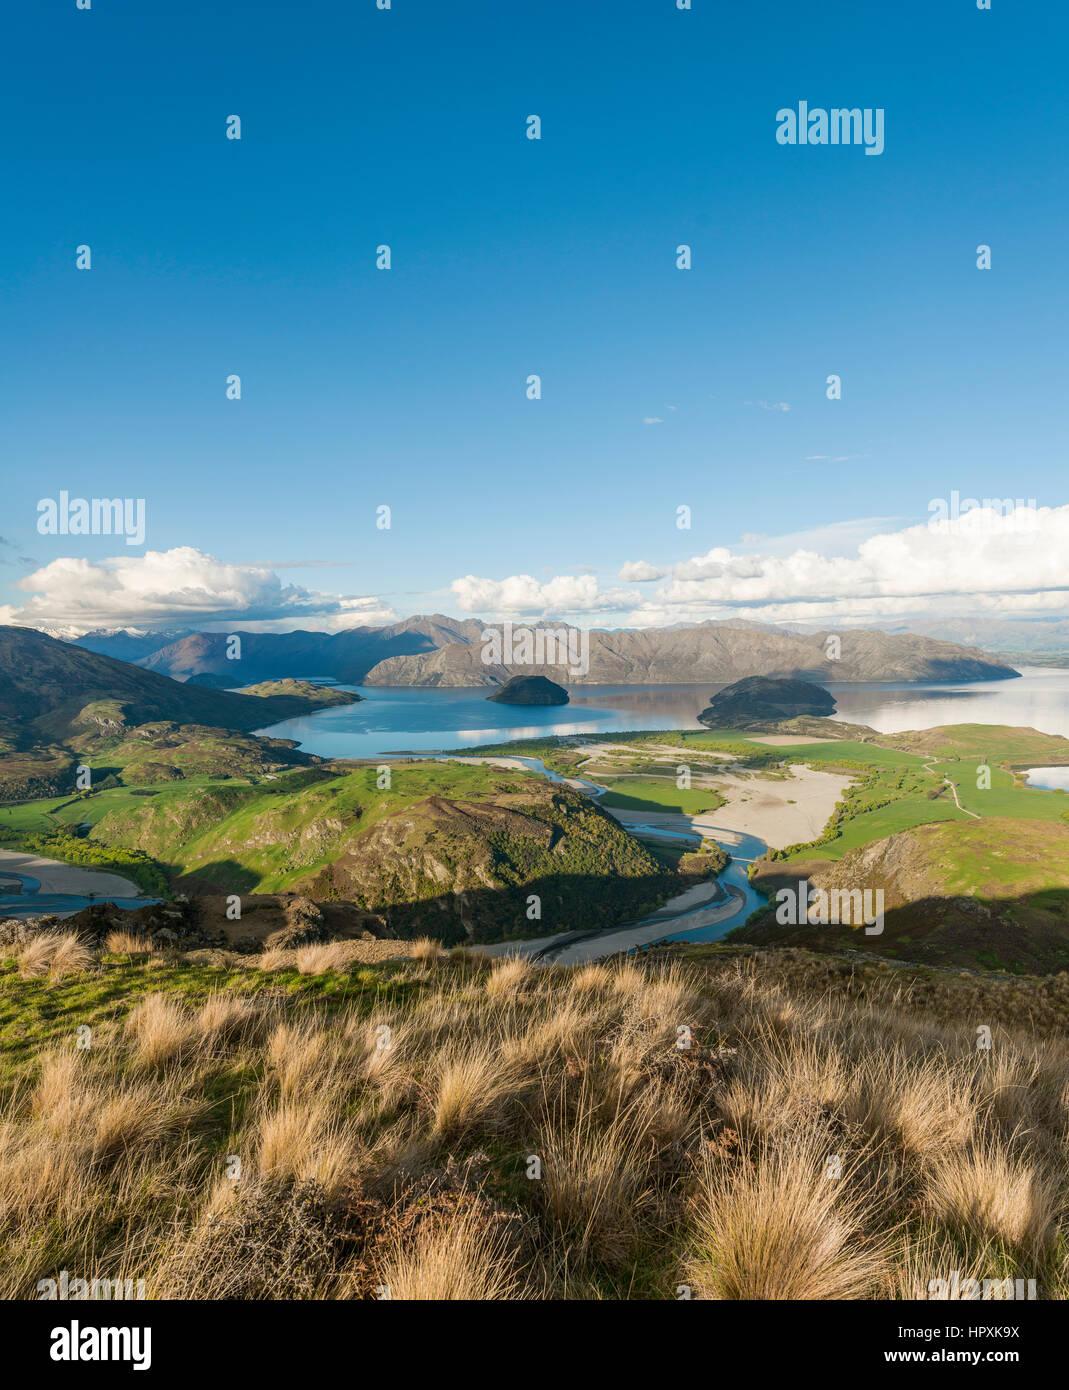 Blick auf Lake Wanaka und Berge, Rocky Peak, Glendhu Bay, Otago und Southland, Neuseeland Stockbild